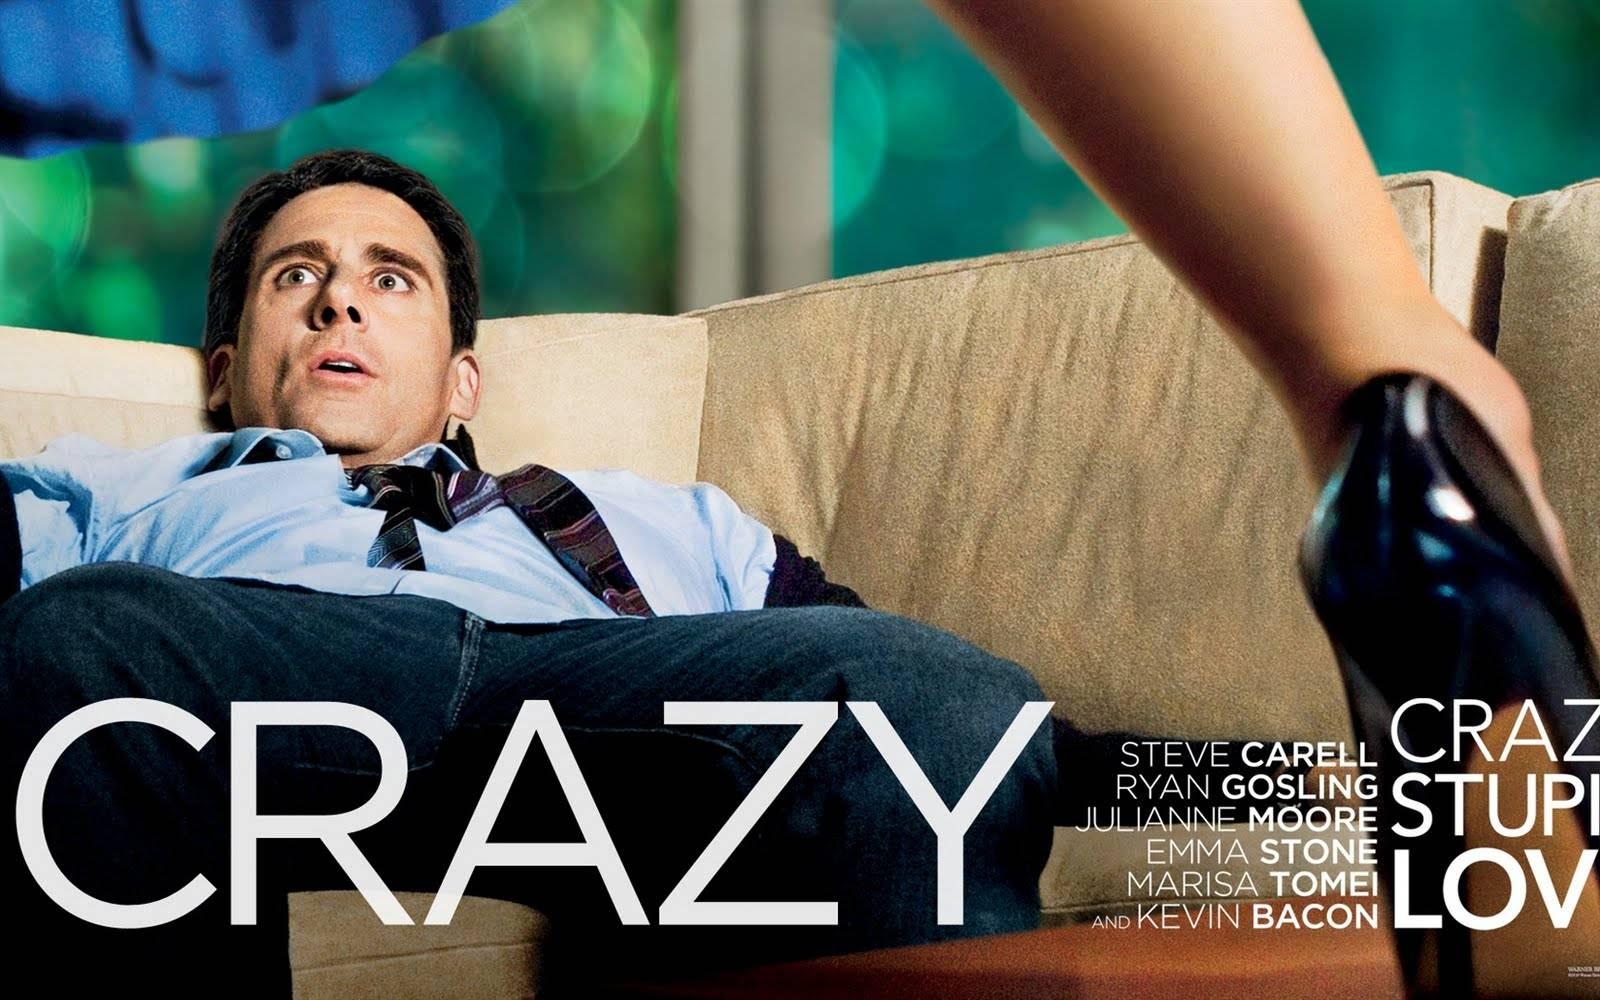 http://4.bp.blogspot.com/--VY6zQ0mPyE/TnF-Amr30wI/AAAAAAAAAxM/B5UwHK4dipE/s1600/Crazy.jpg